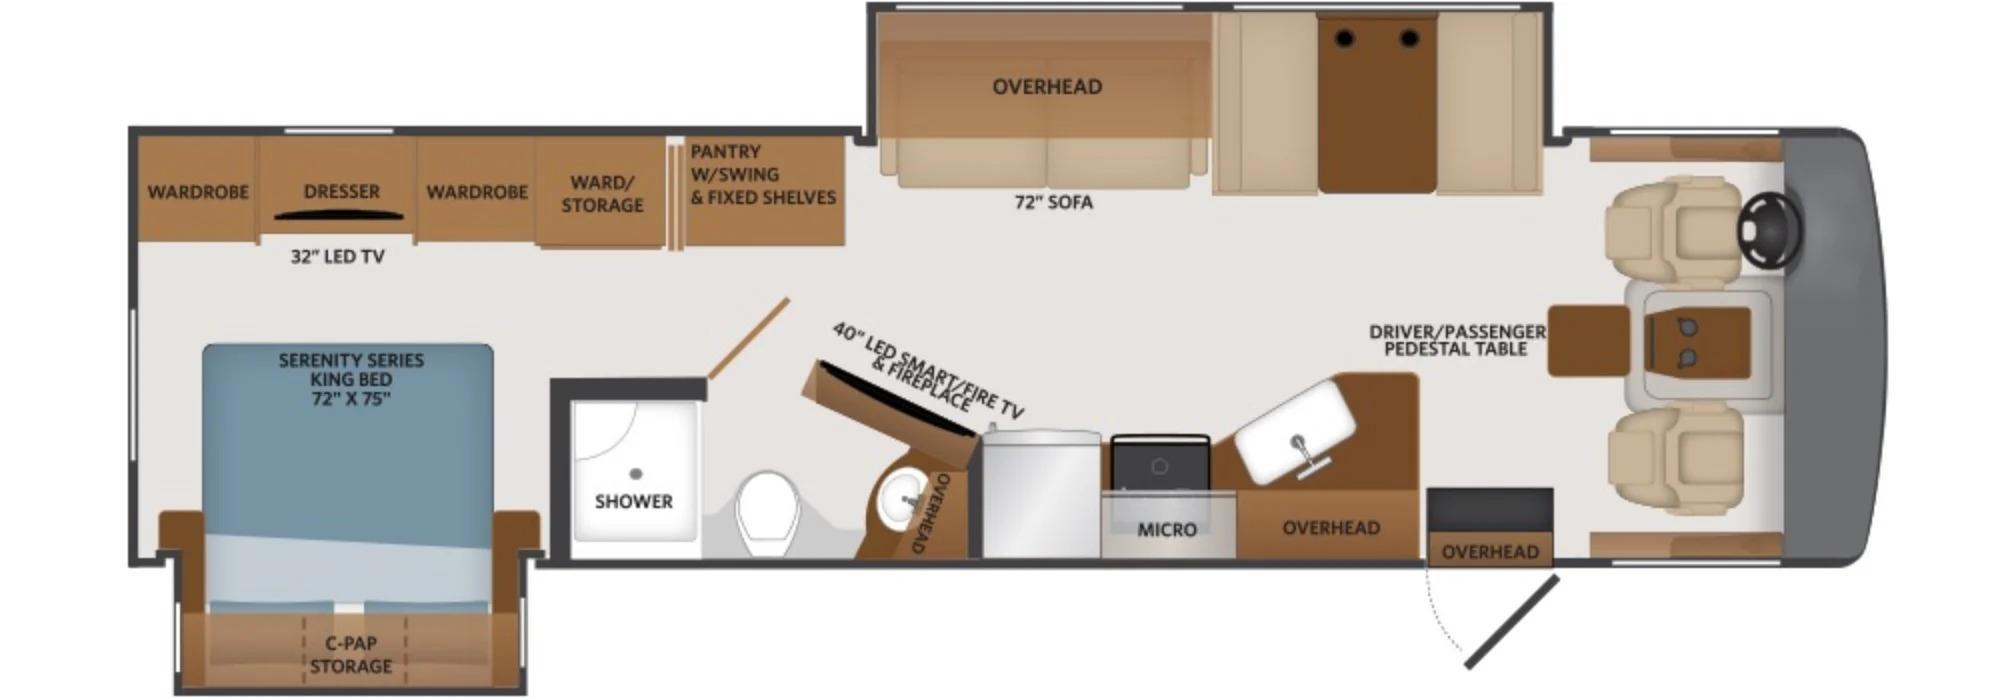 View Floor Plan for 2022 FLEETWOOD FORTIS 34MB